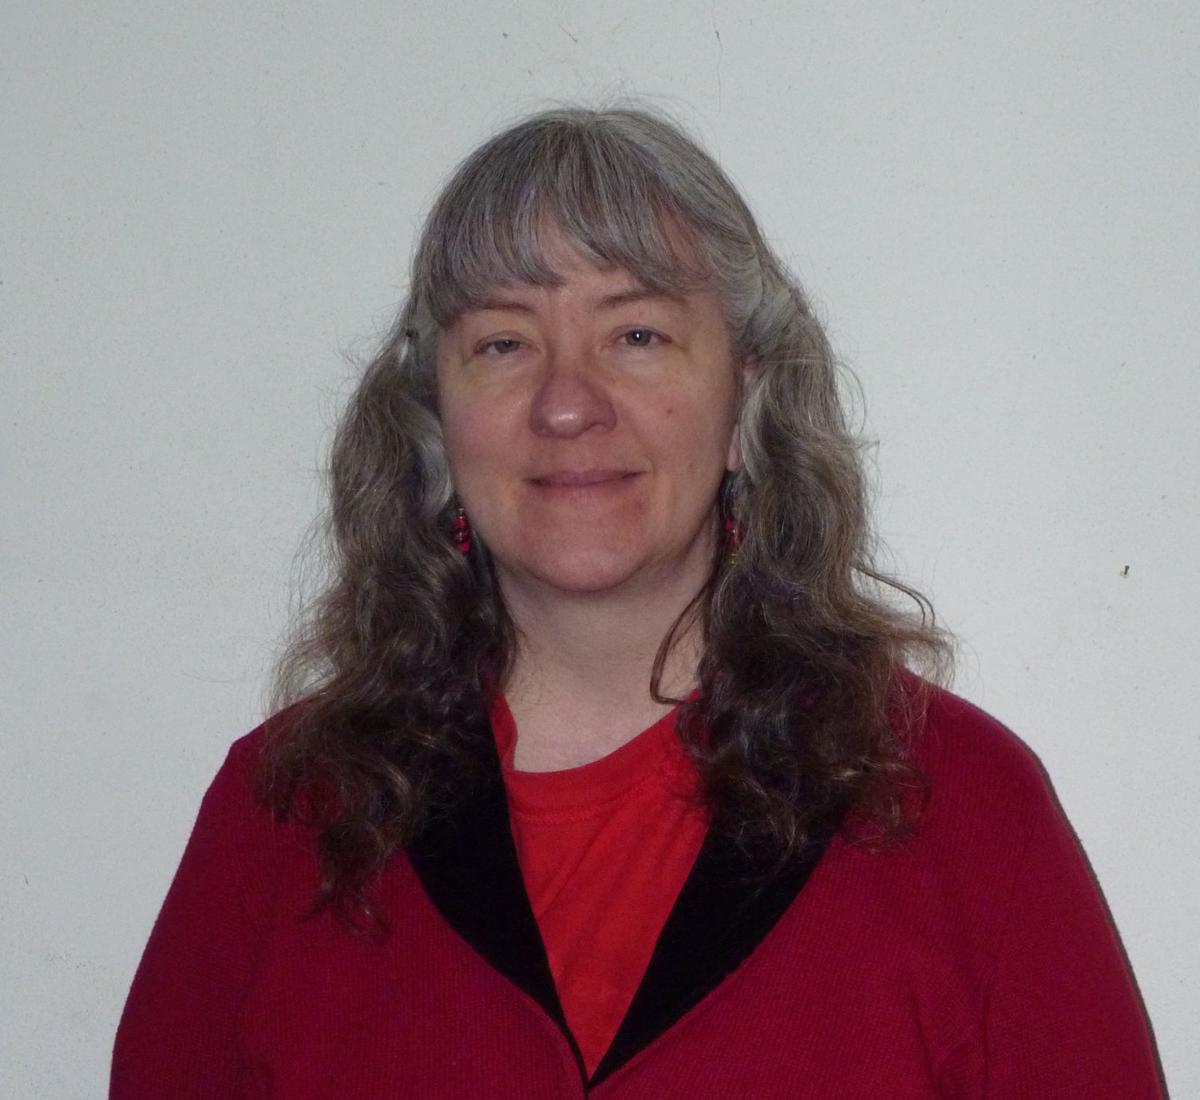 Marcia Vlach Colsmith